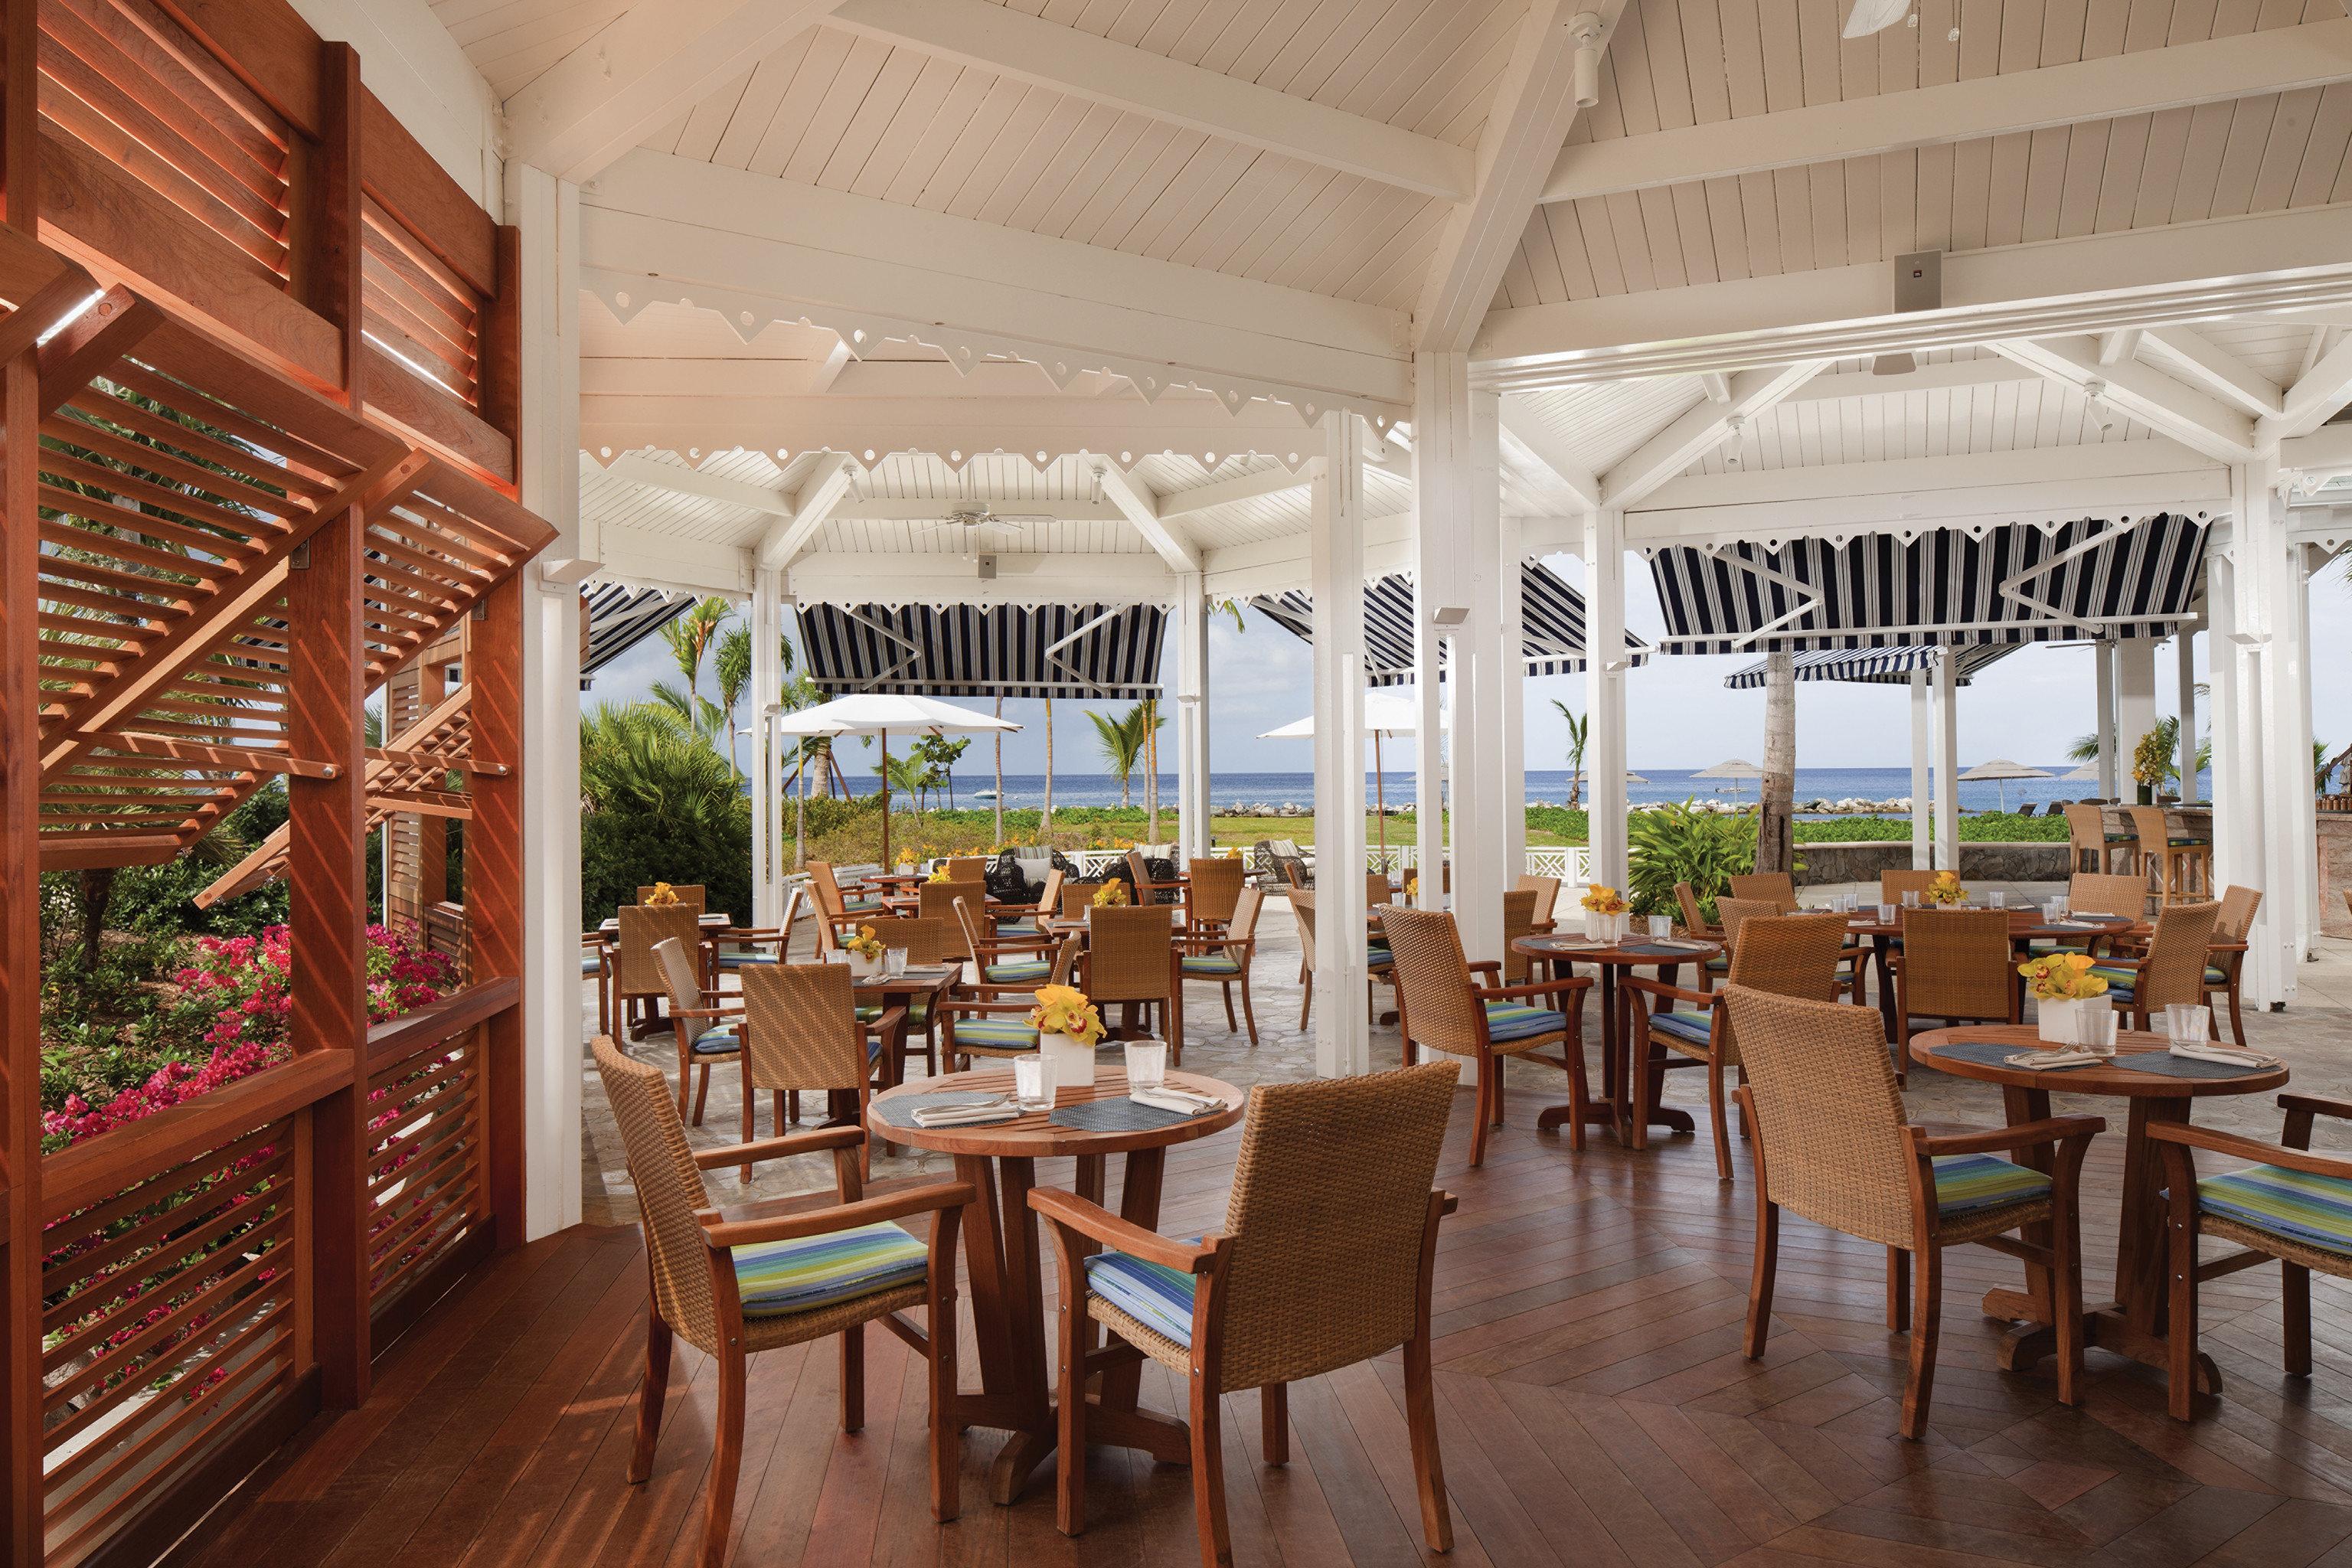 Bar Deck Dining Drink Eat chair restaurant Resort wooden function hall